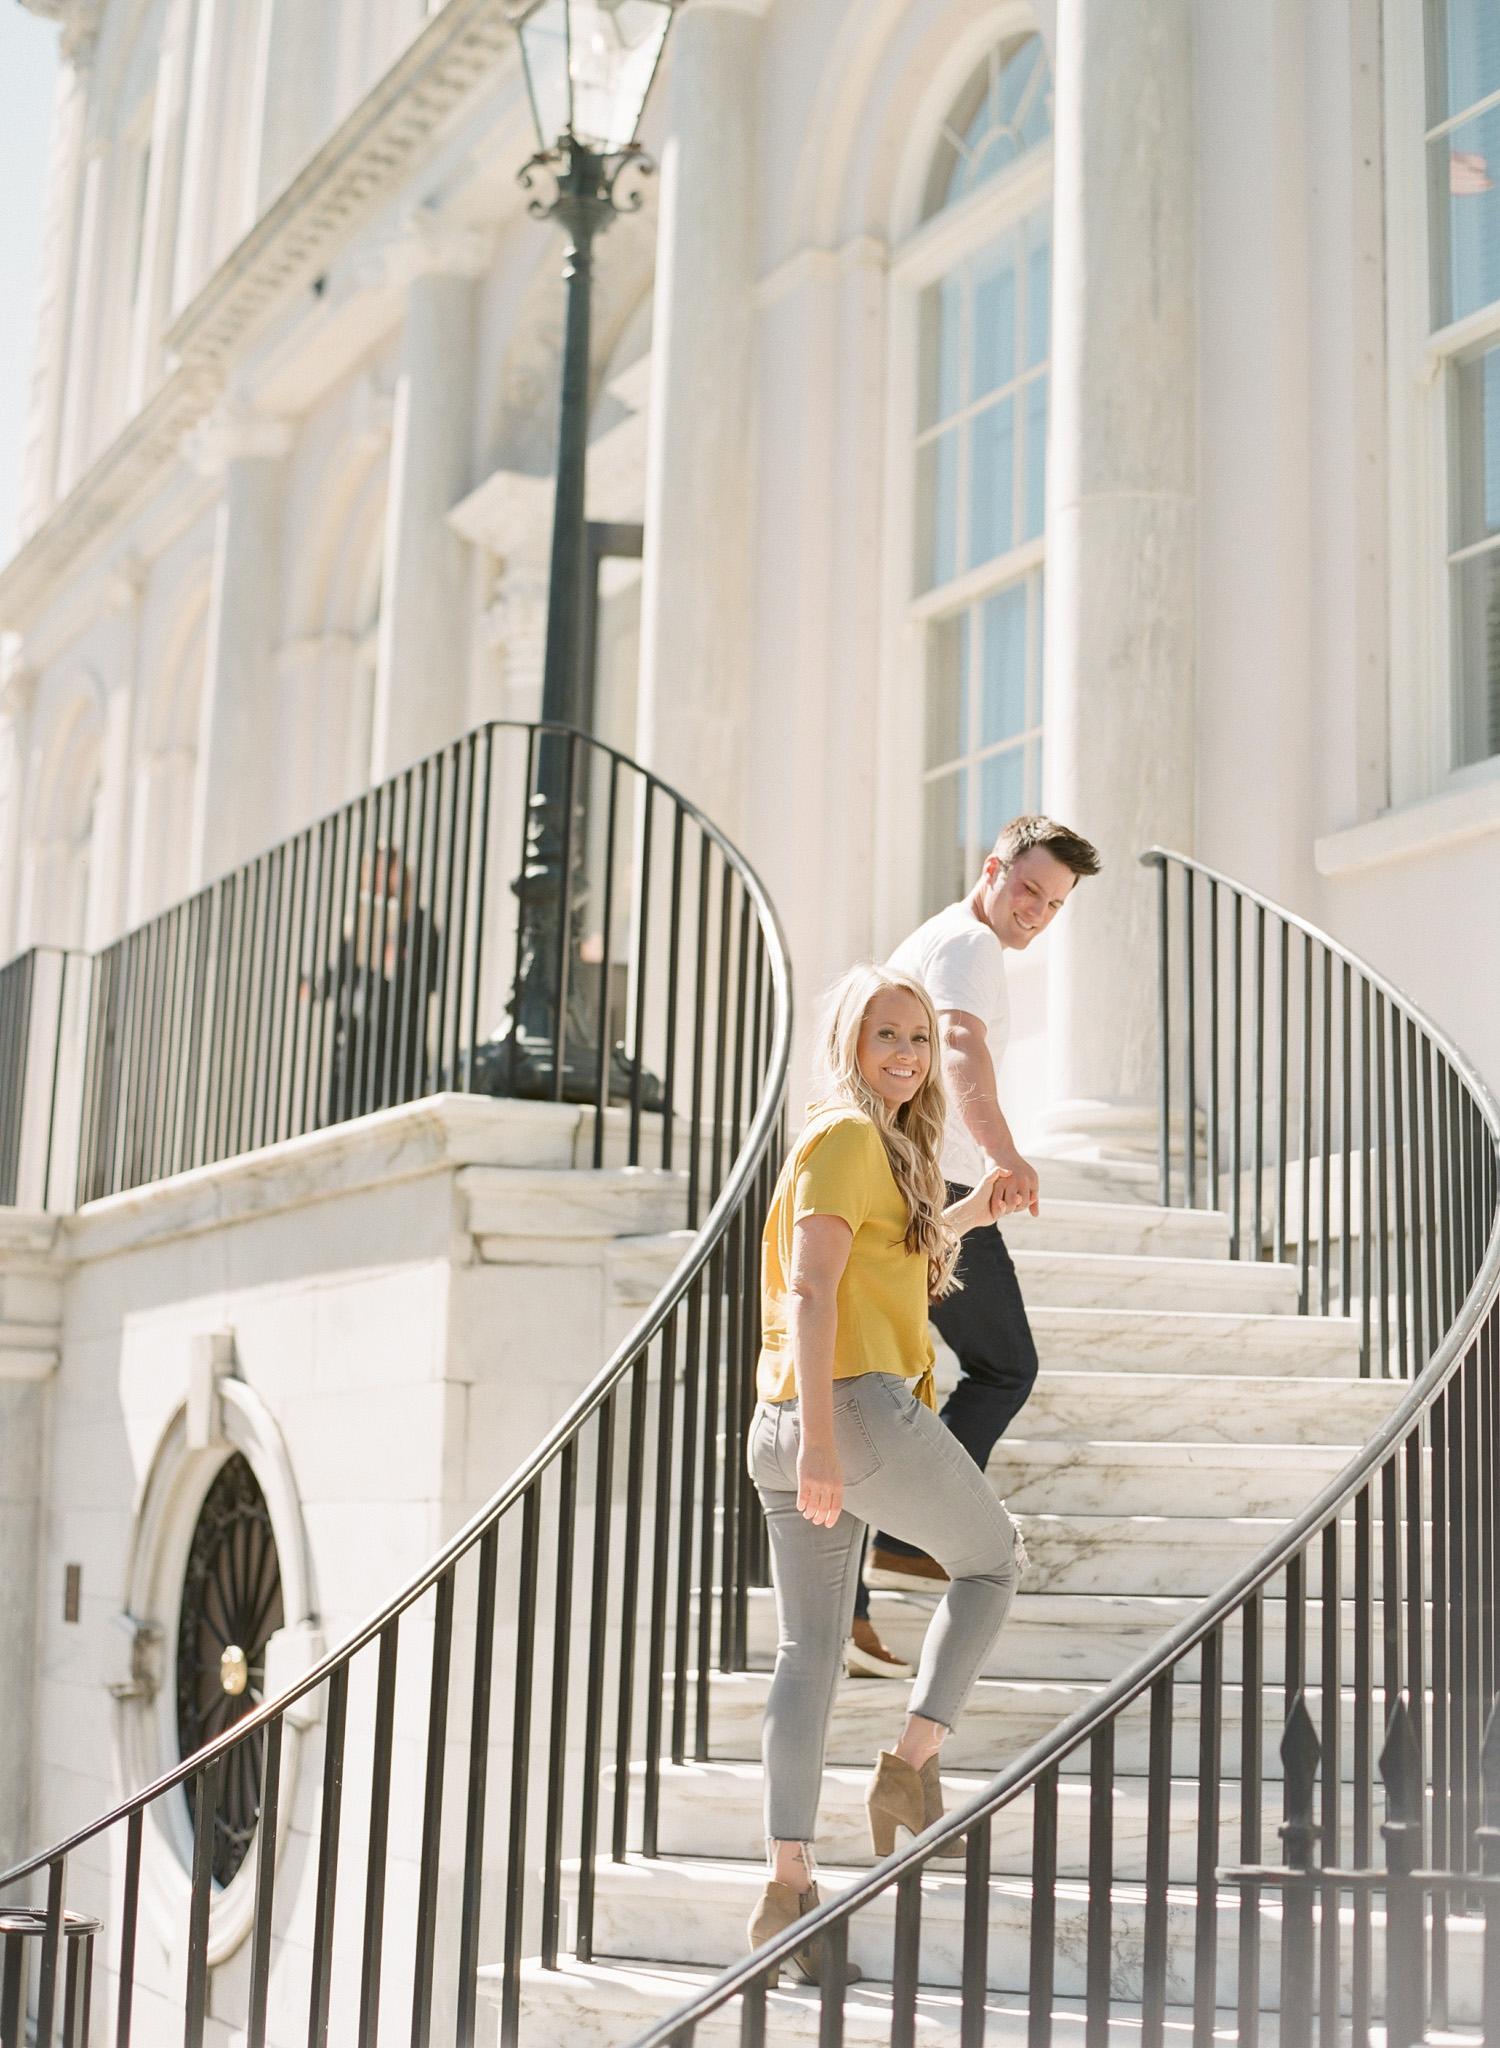 Charleston-Engagement-Downtown-23.jpg